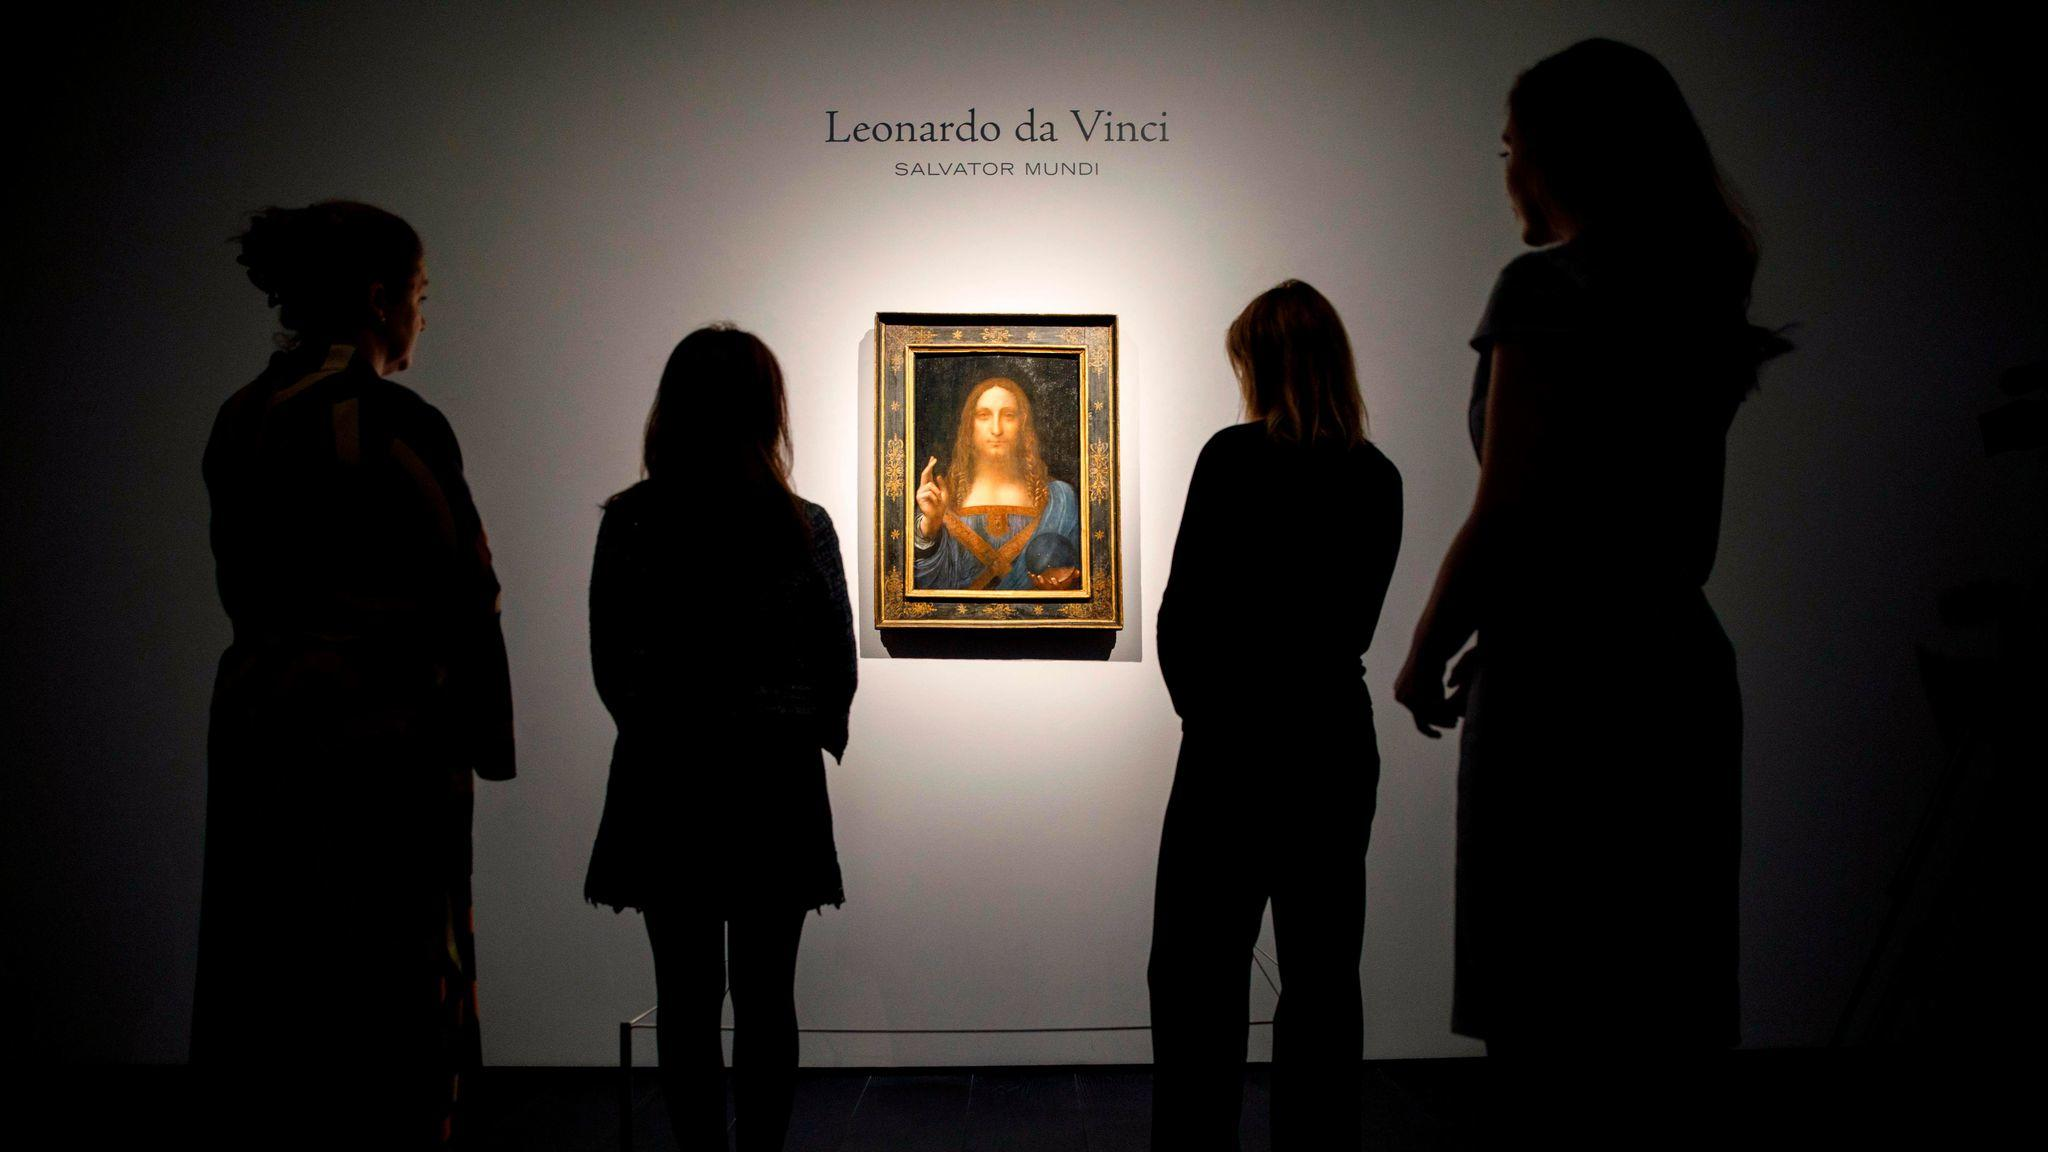 The Leonardo da Vinci painting that set a record with a sale price of $450 million. (Tolga Akmen / AFP/Getty Images)